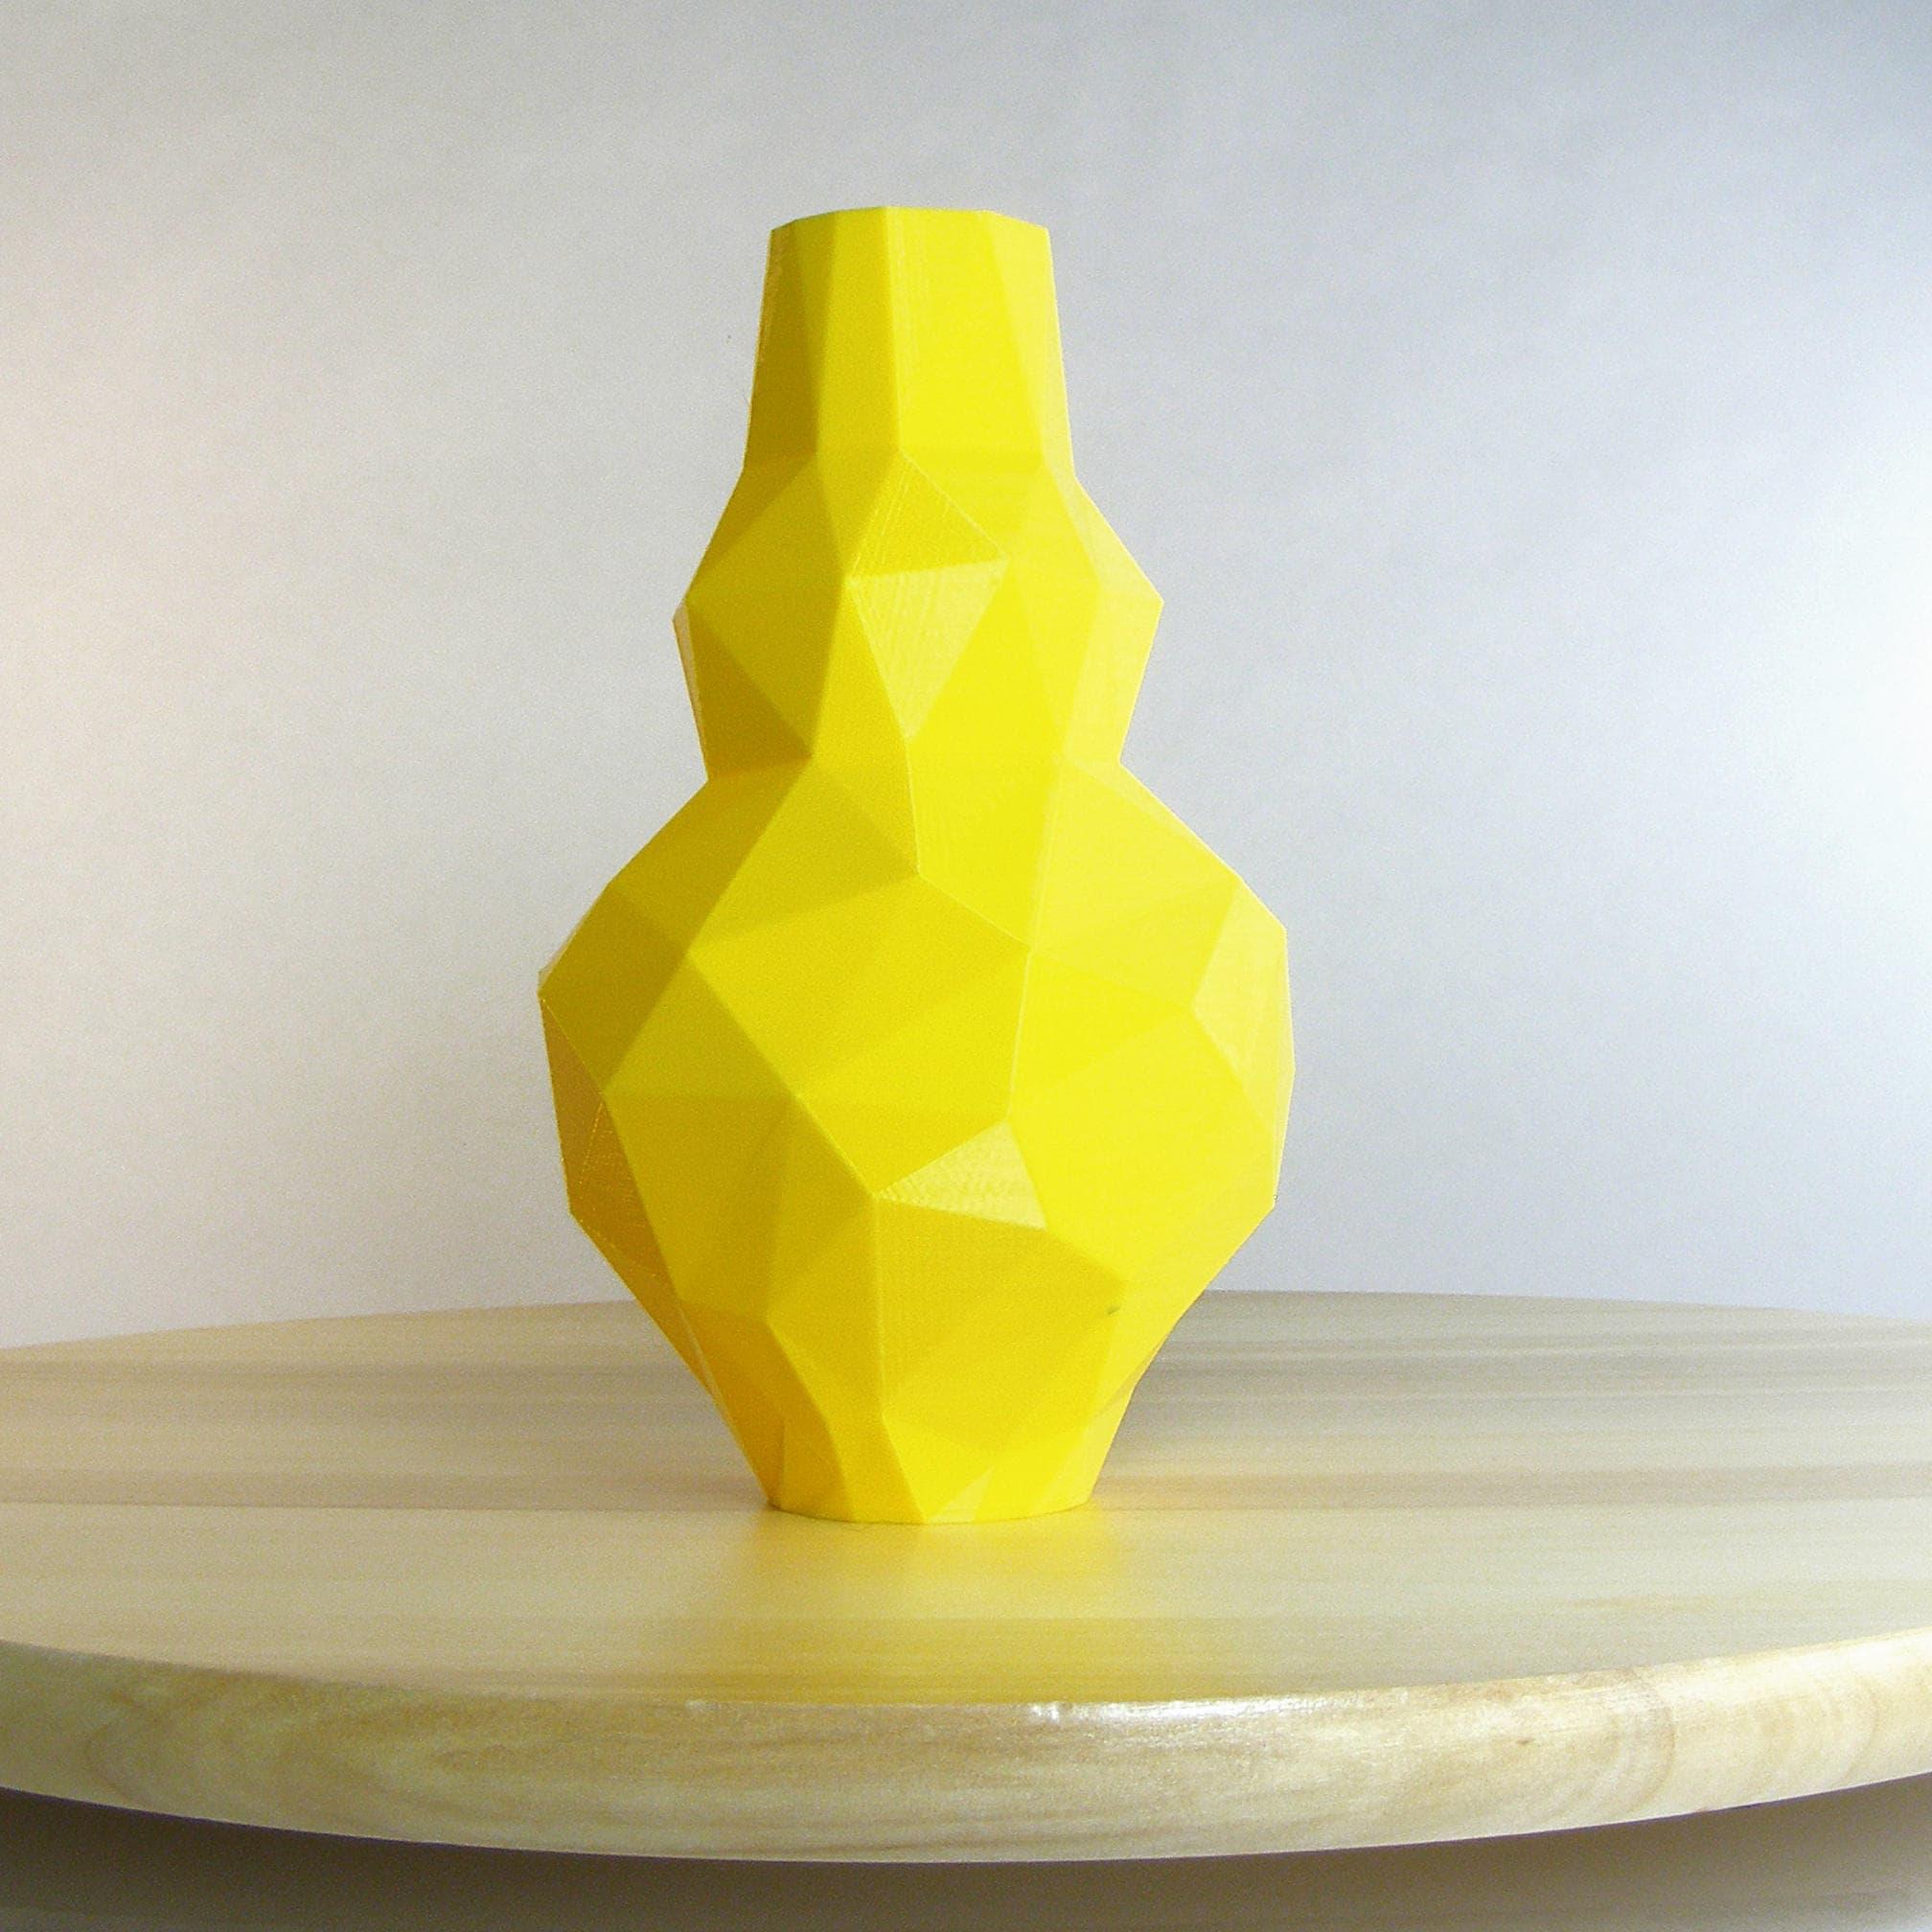 Lemon Yellow Vase low poly yellow decor Yellow Kitchen